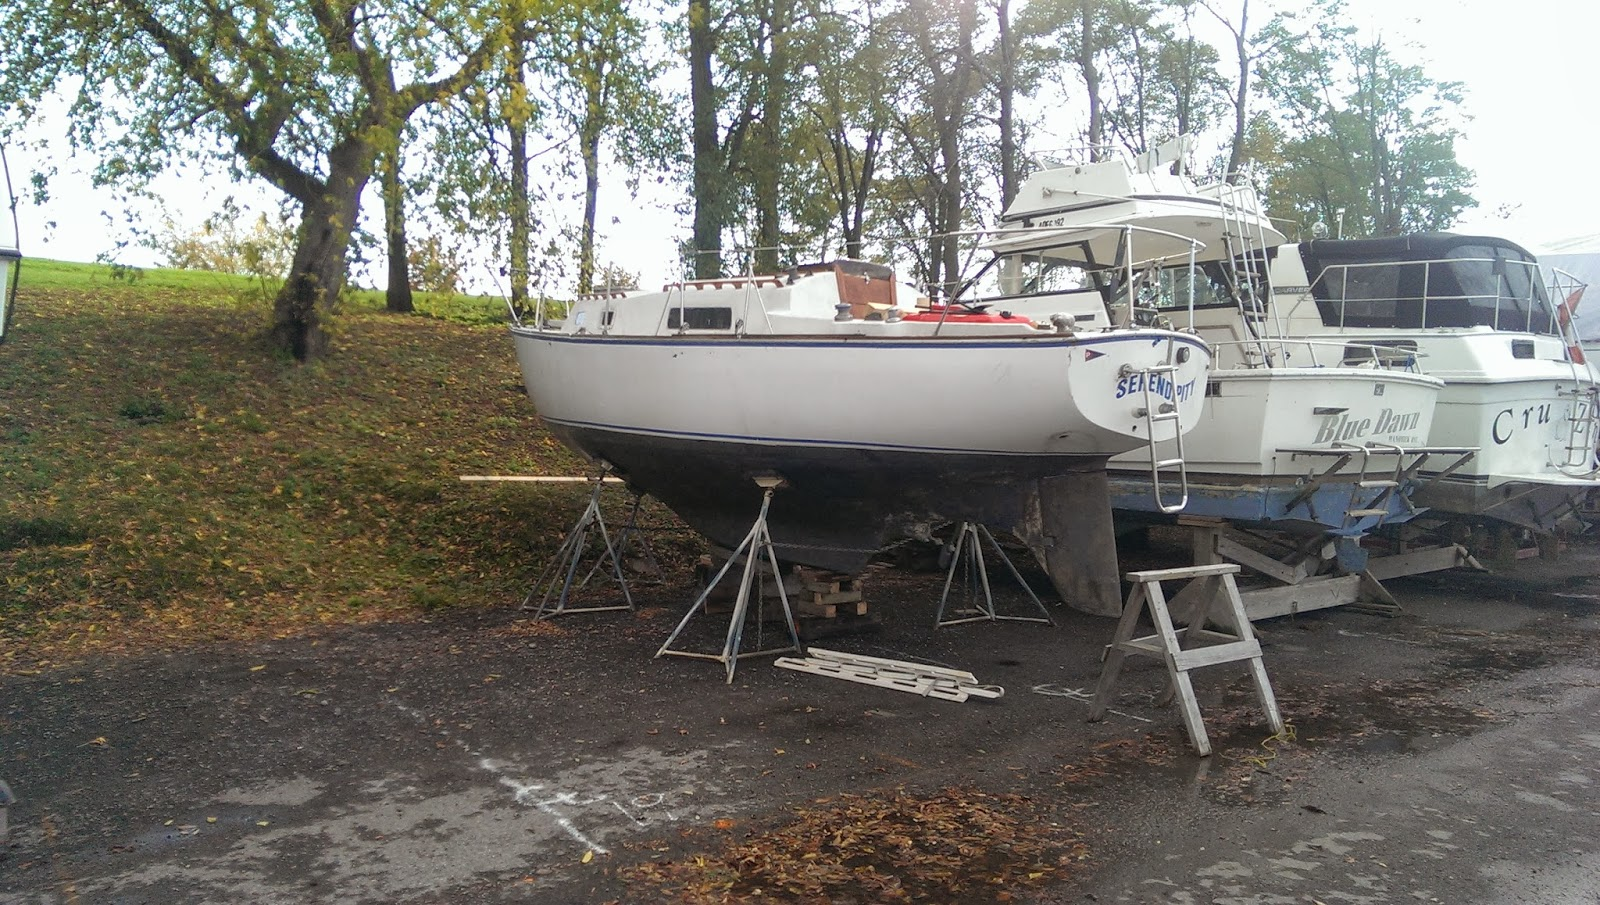 Serendipity Irwin 28 Boat Build